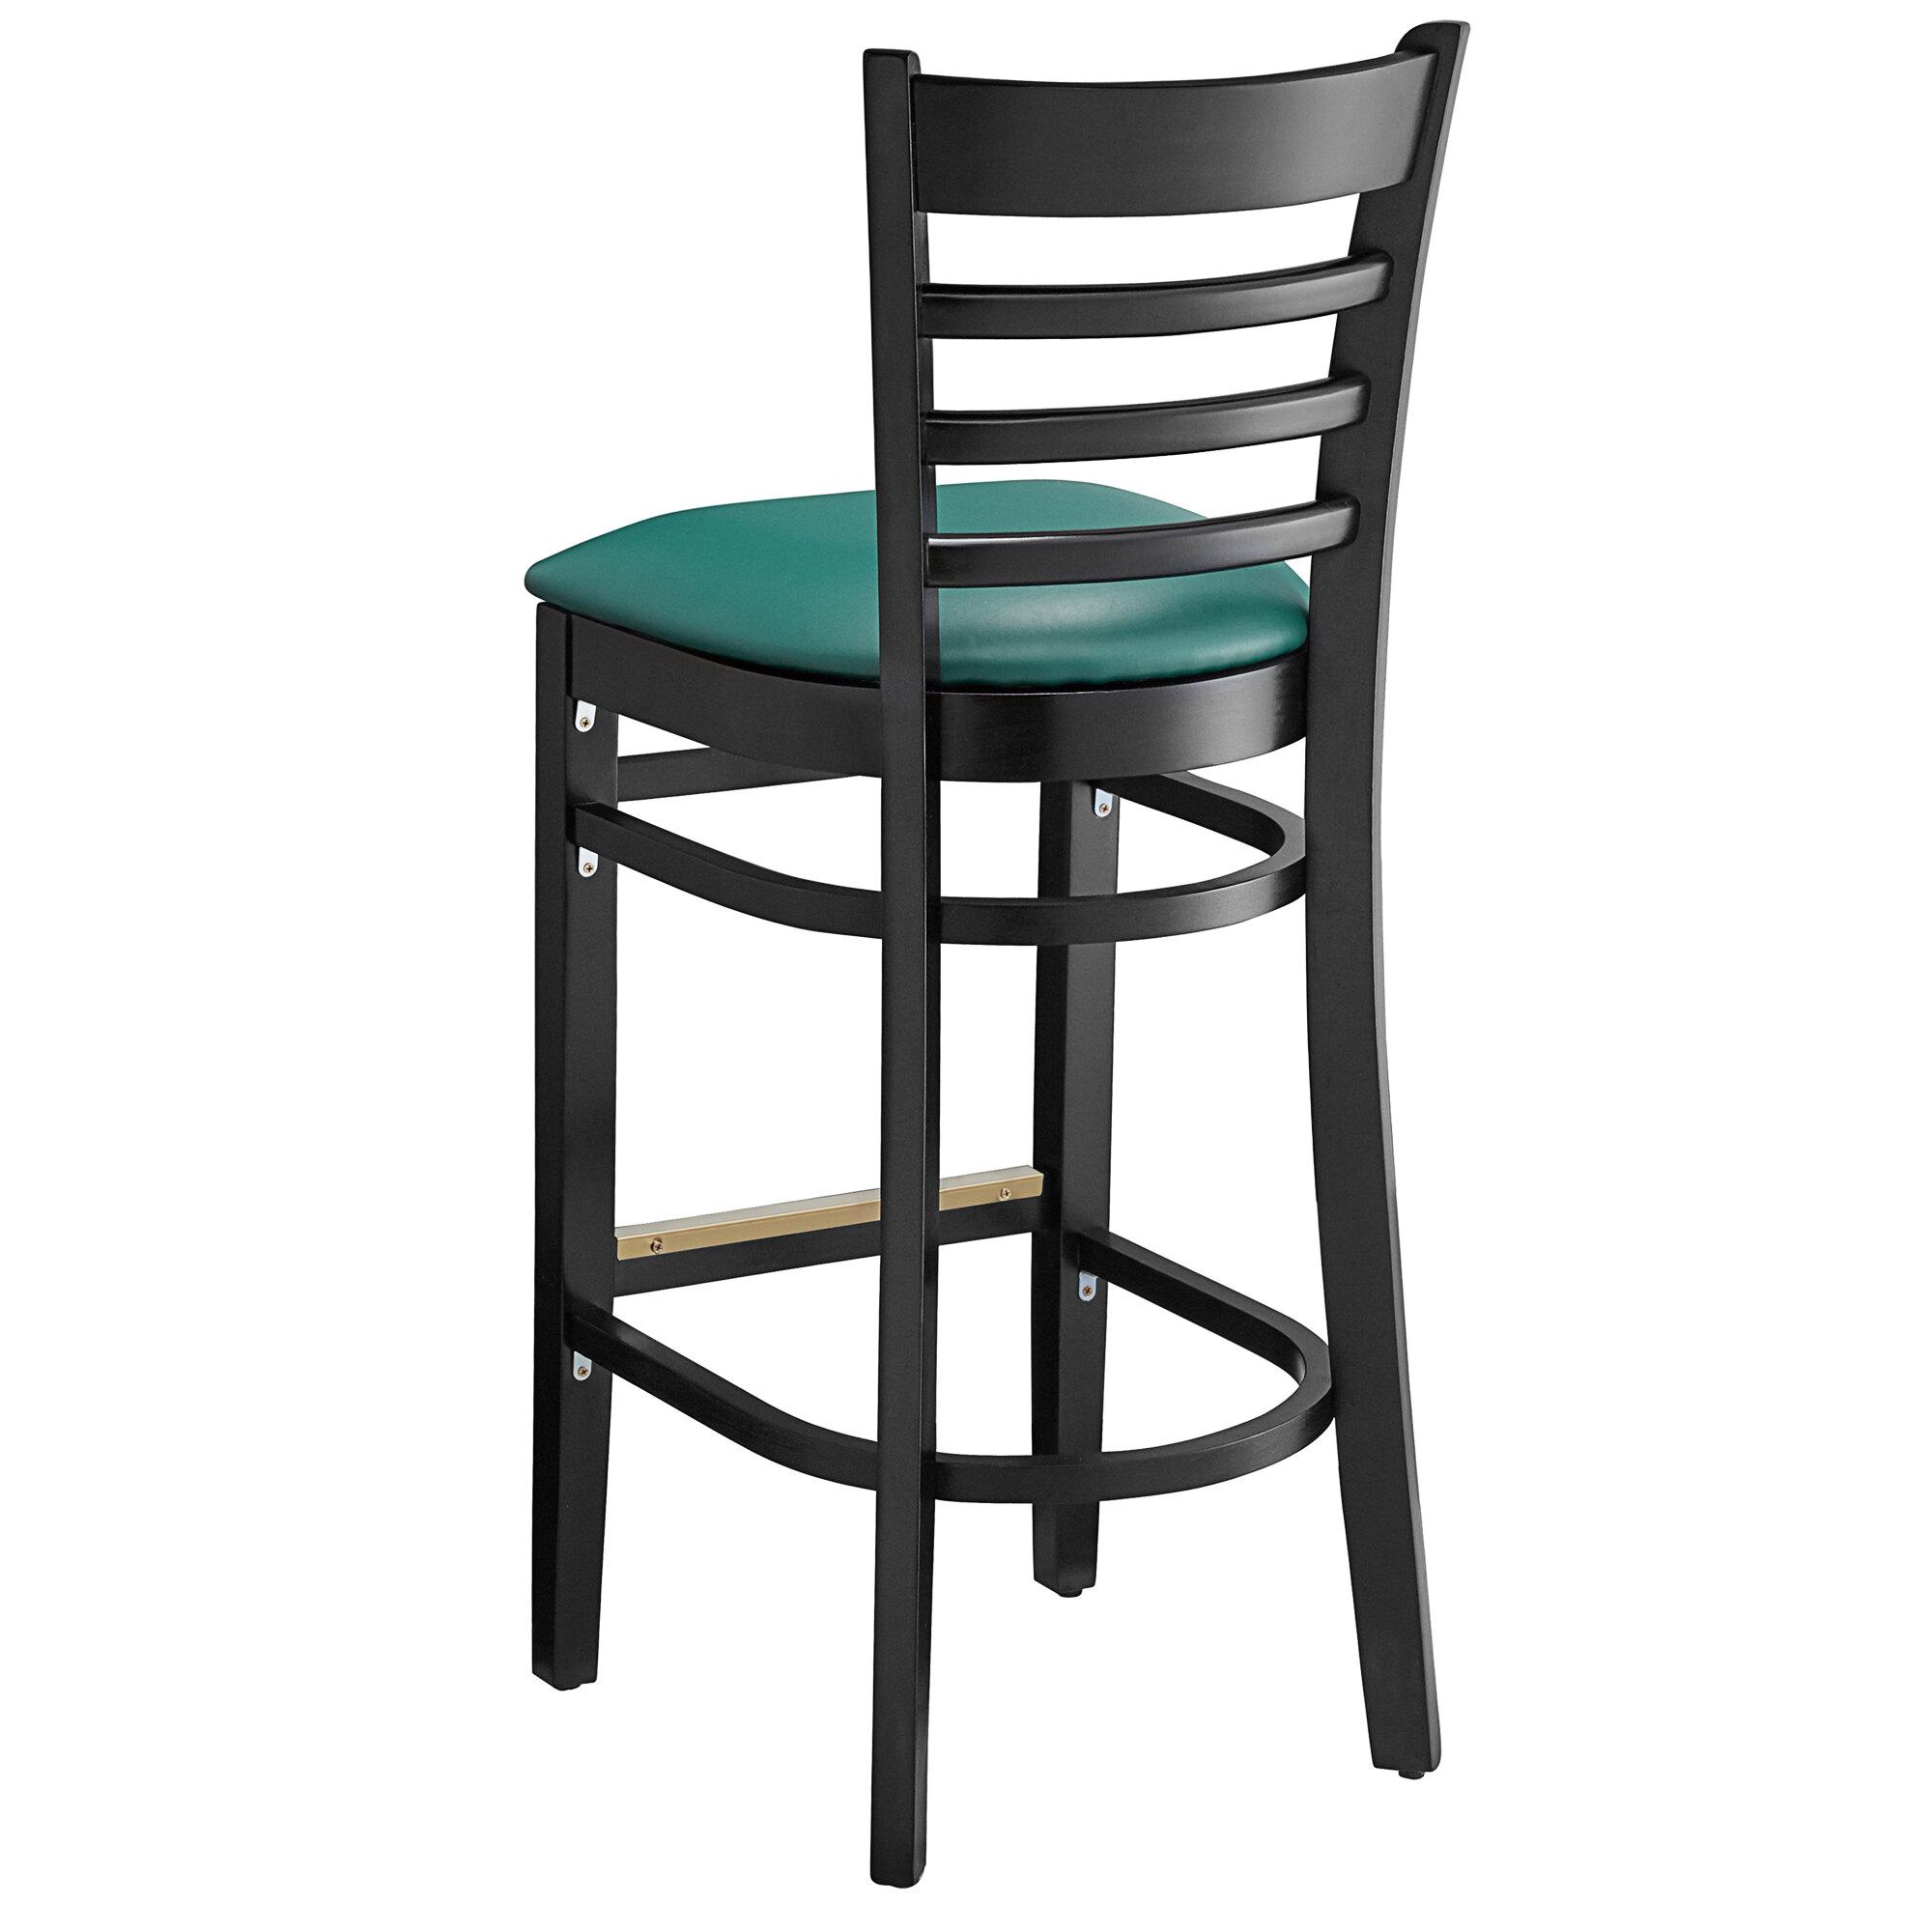 #82 - Black Wood Finished Ladder Back Restaurant Barstool with Green Vinyl Seat